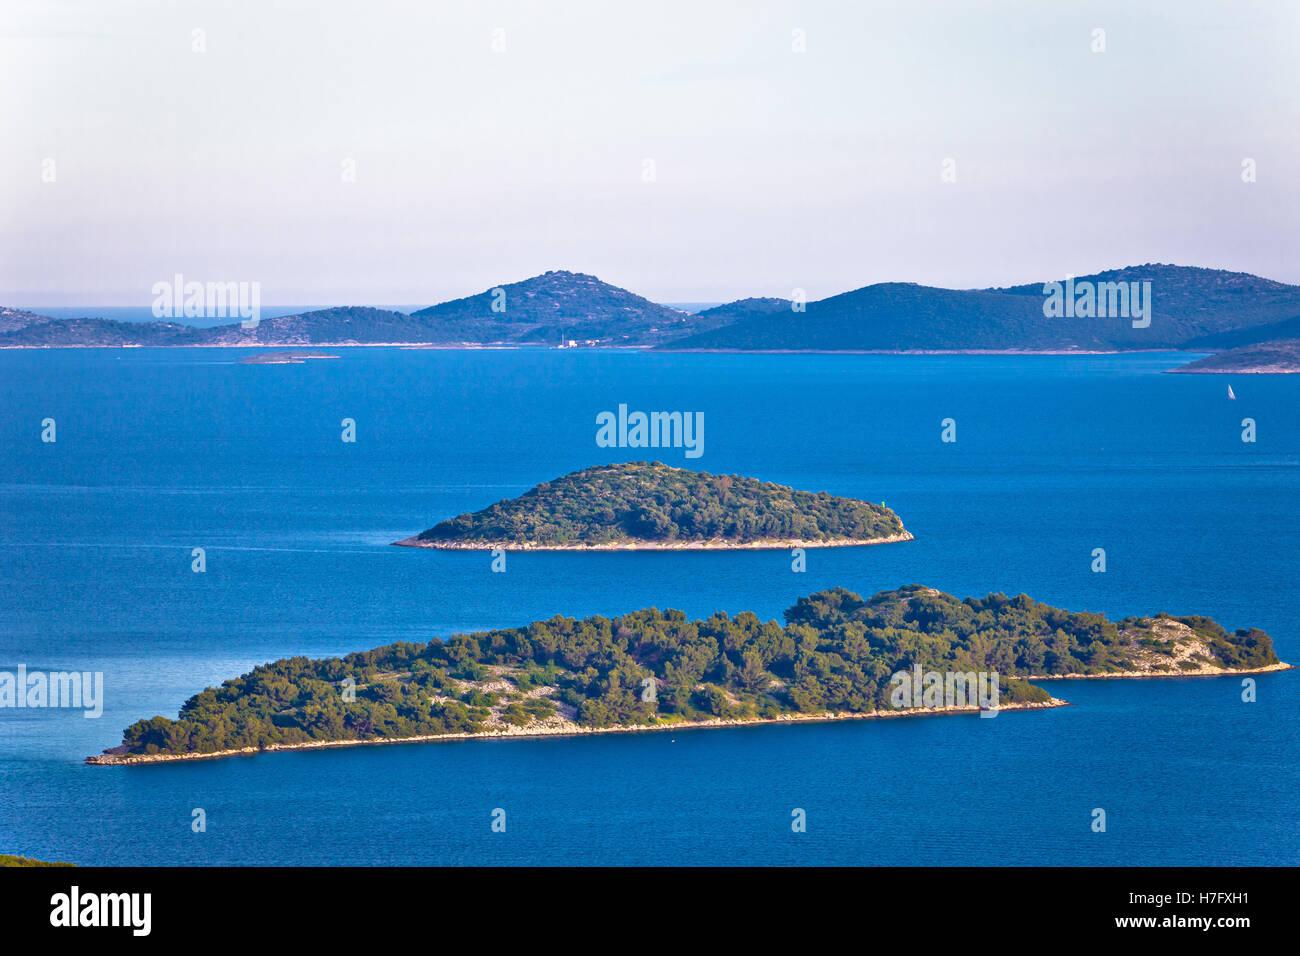 Adriatic archipelago of Croatia view, Kornati islands national park, Dalmatia - Stock Image